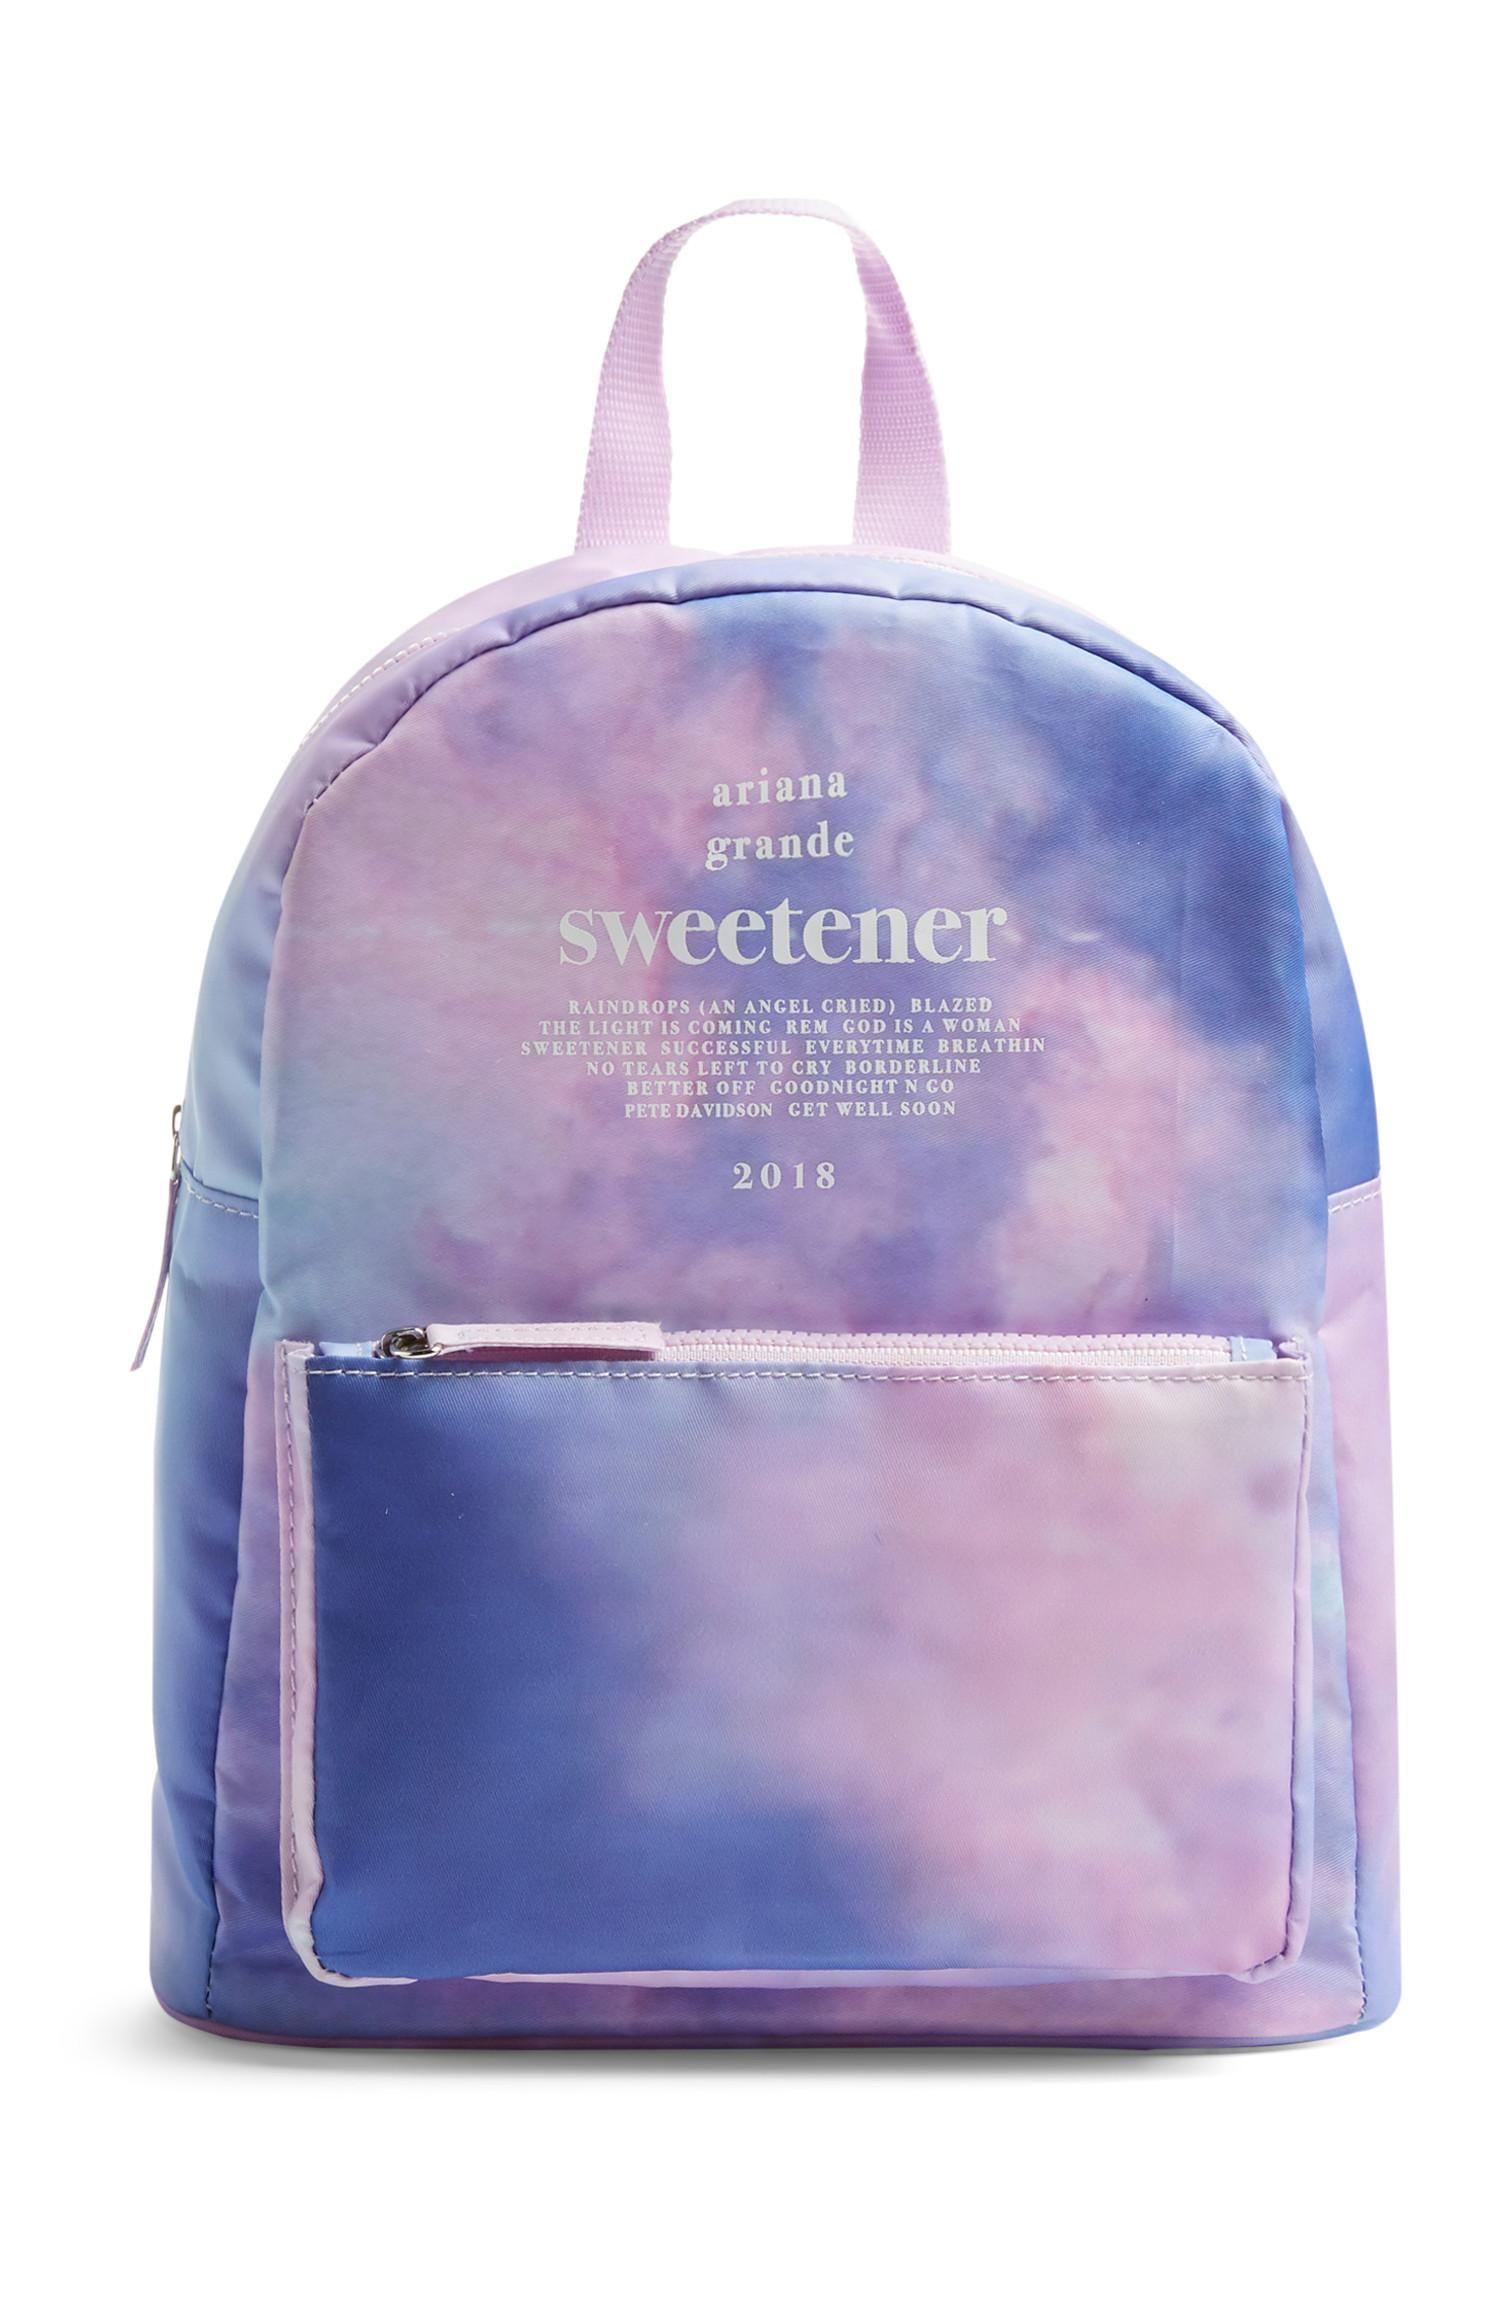 Ariana grande sweetener backpack in 2020 ariana grande